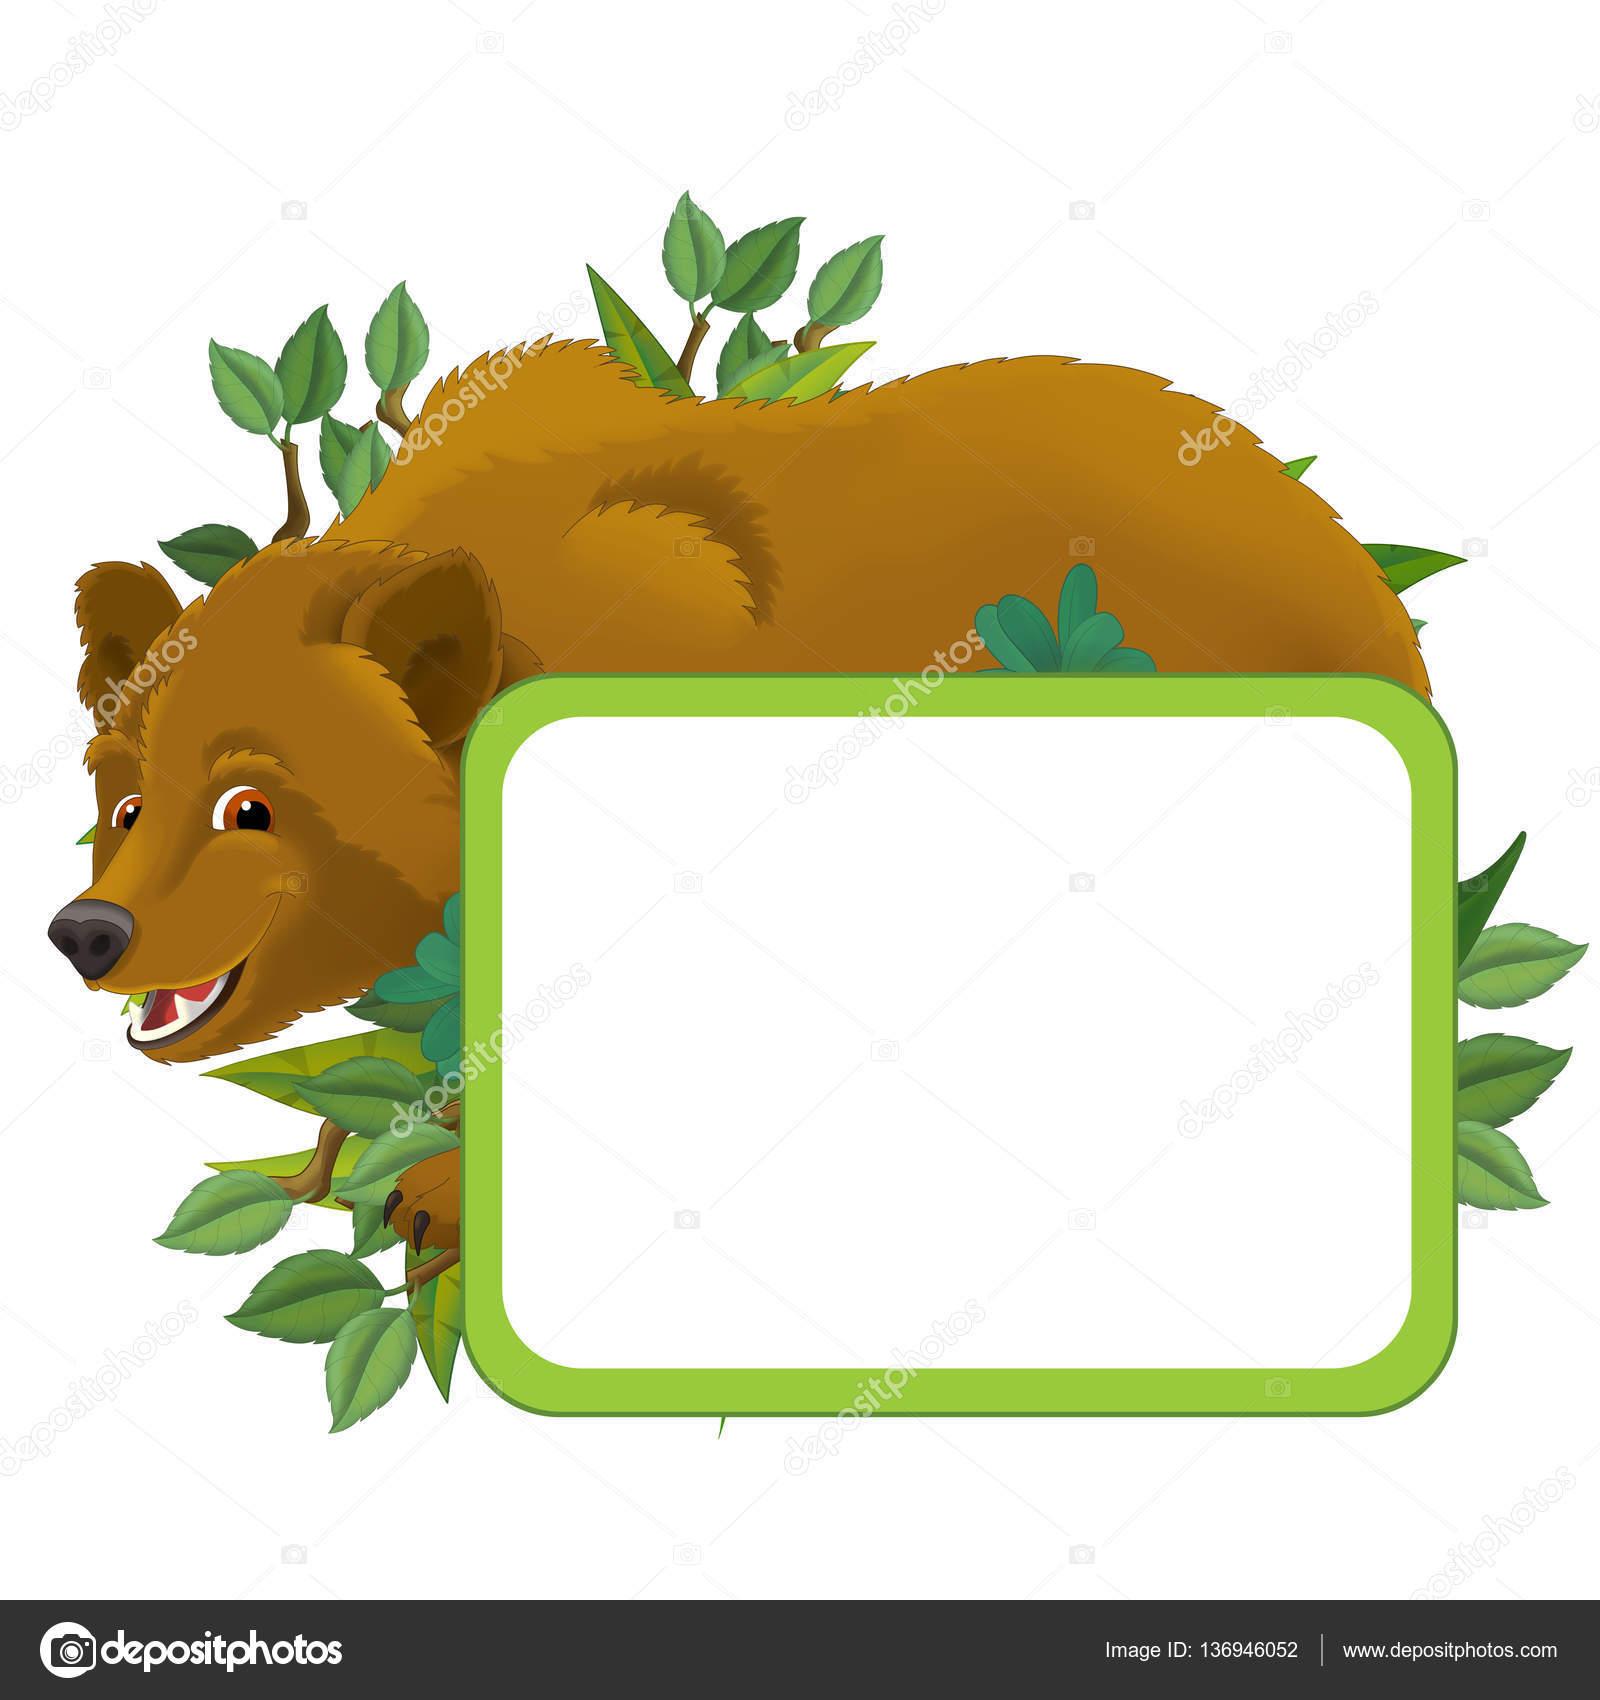 Cartoon-Rahmen mit Tier — Stockfoto © agaes8080 #136946052